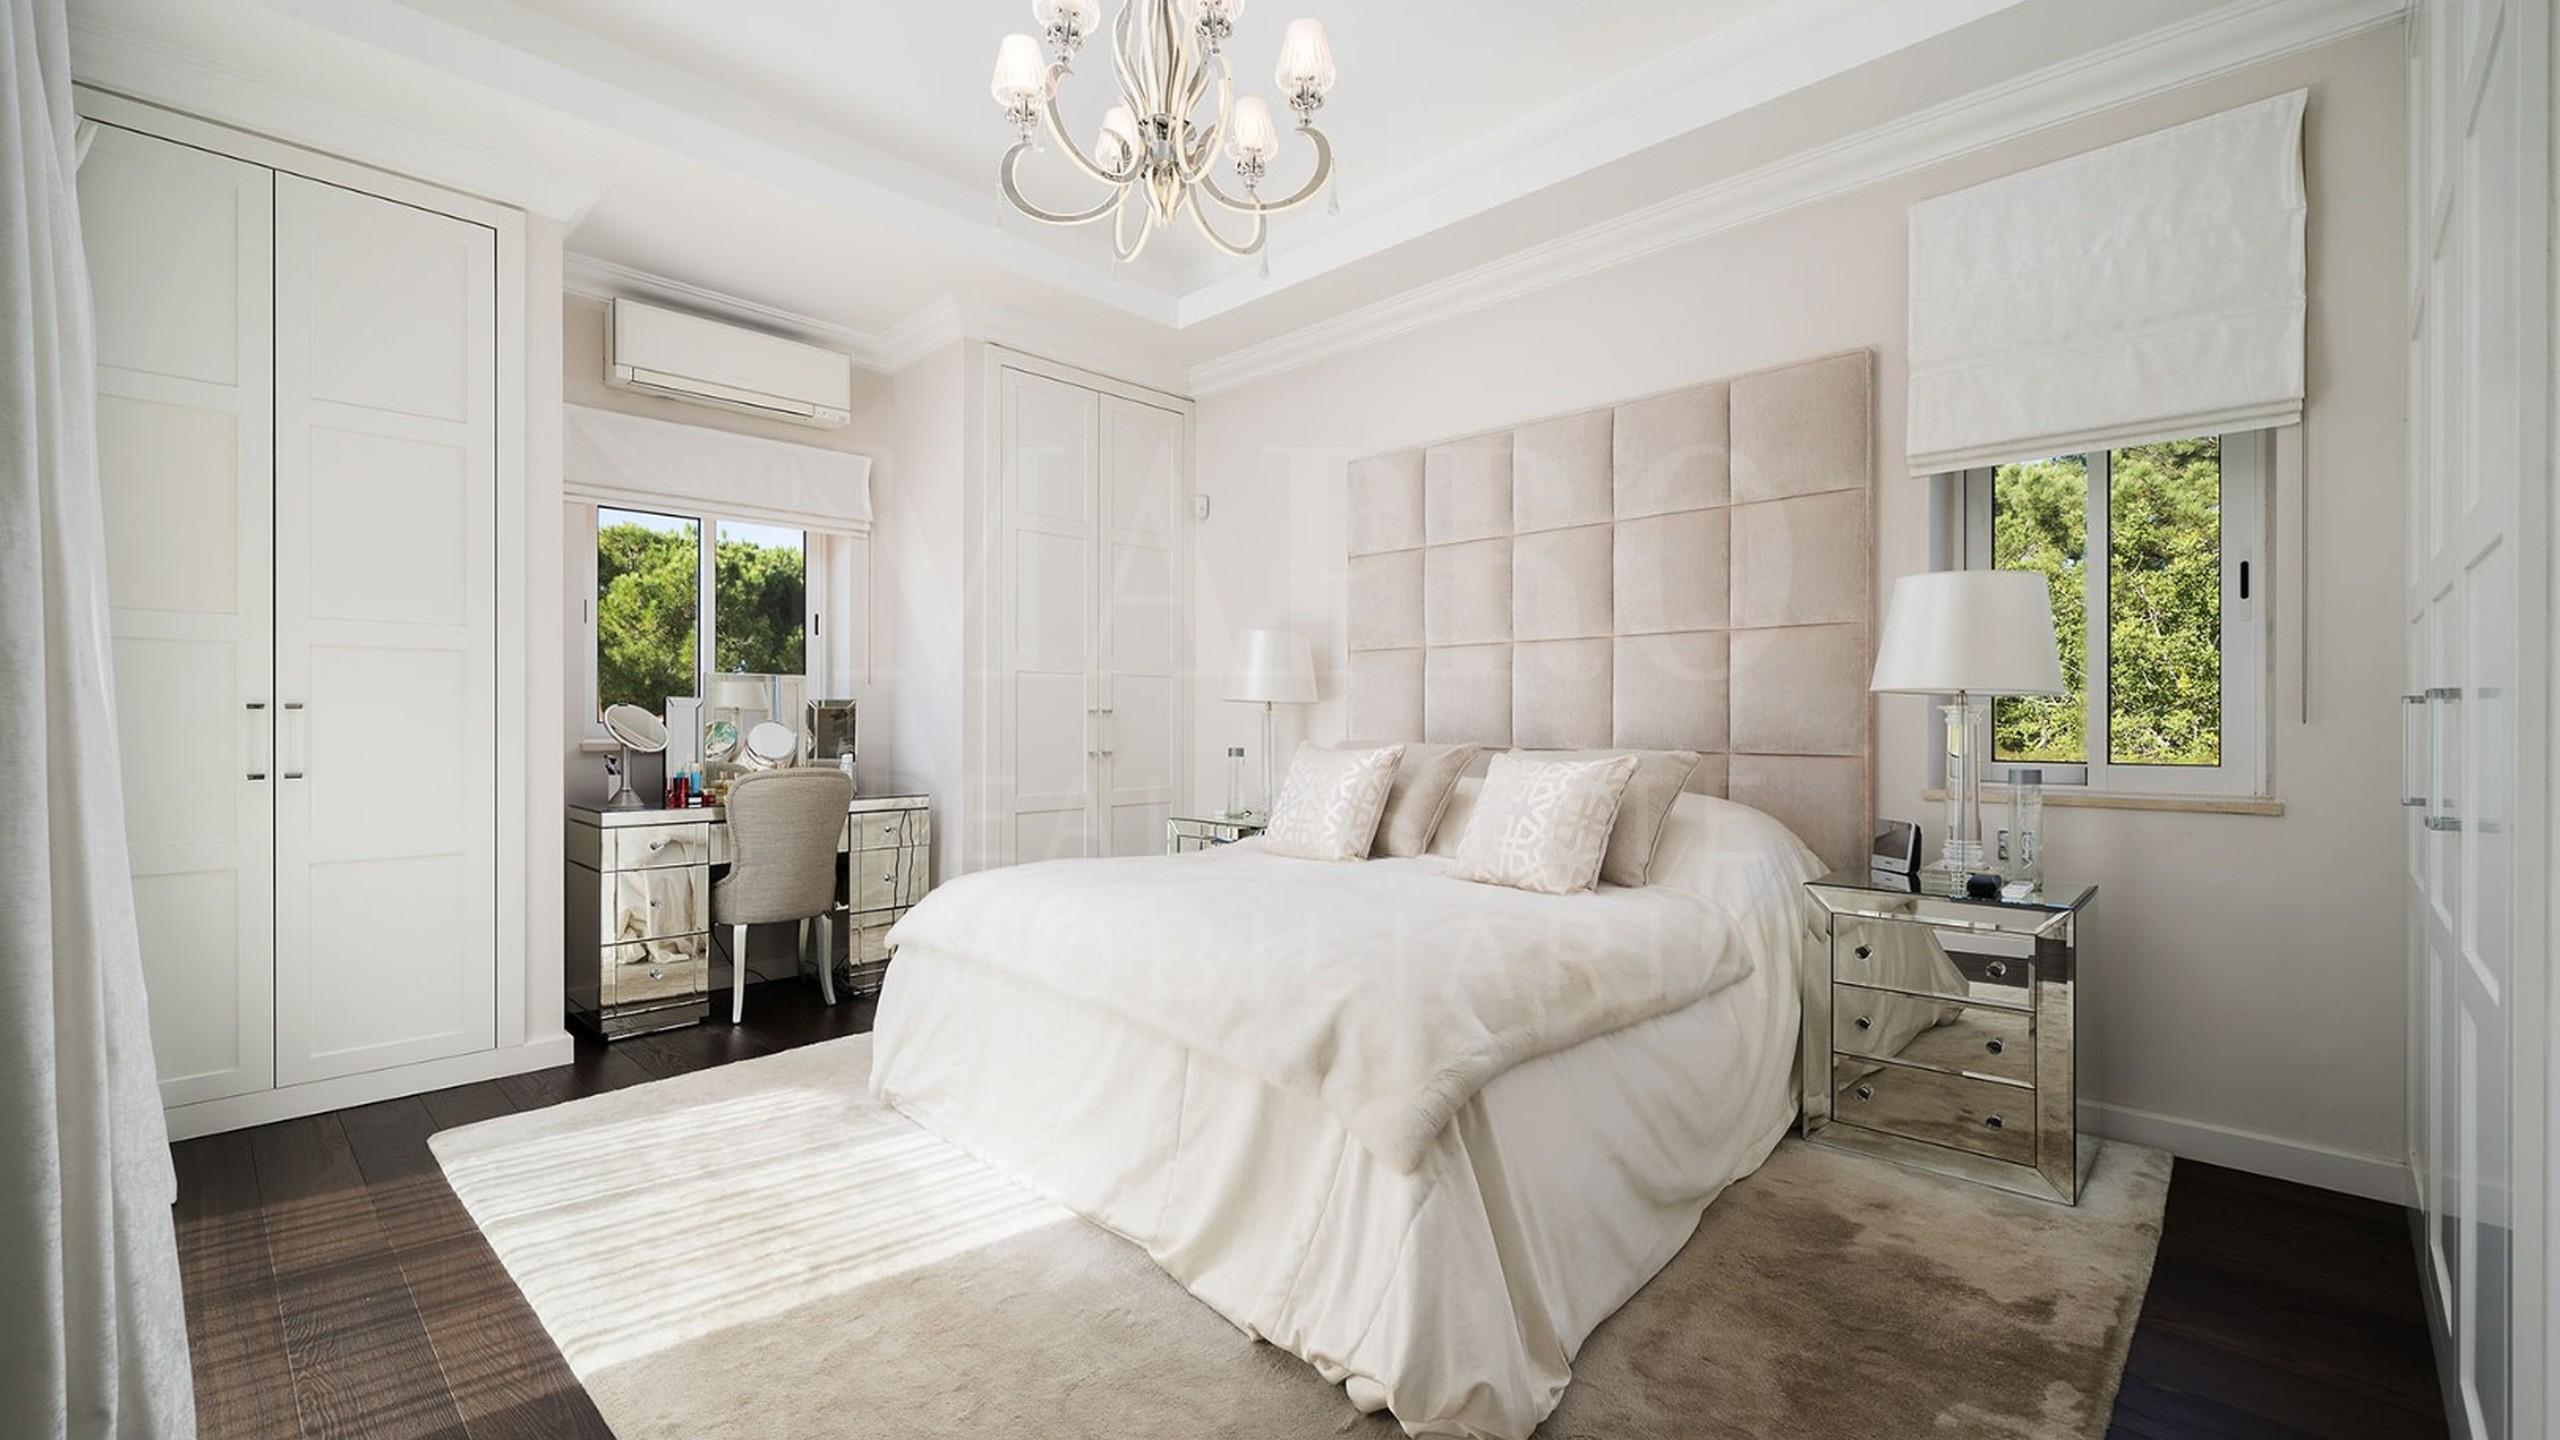 Bedroom with kingsizebed